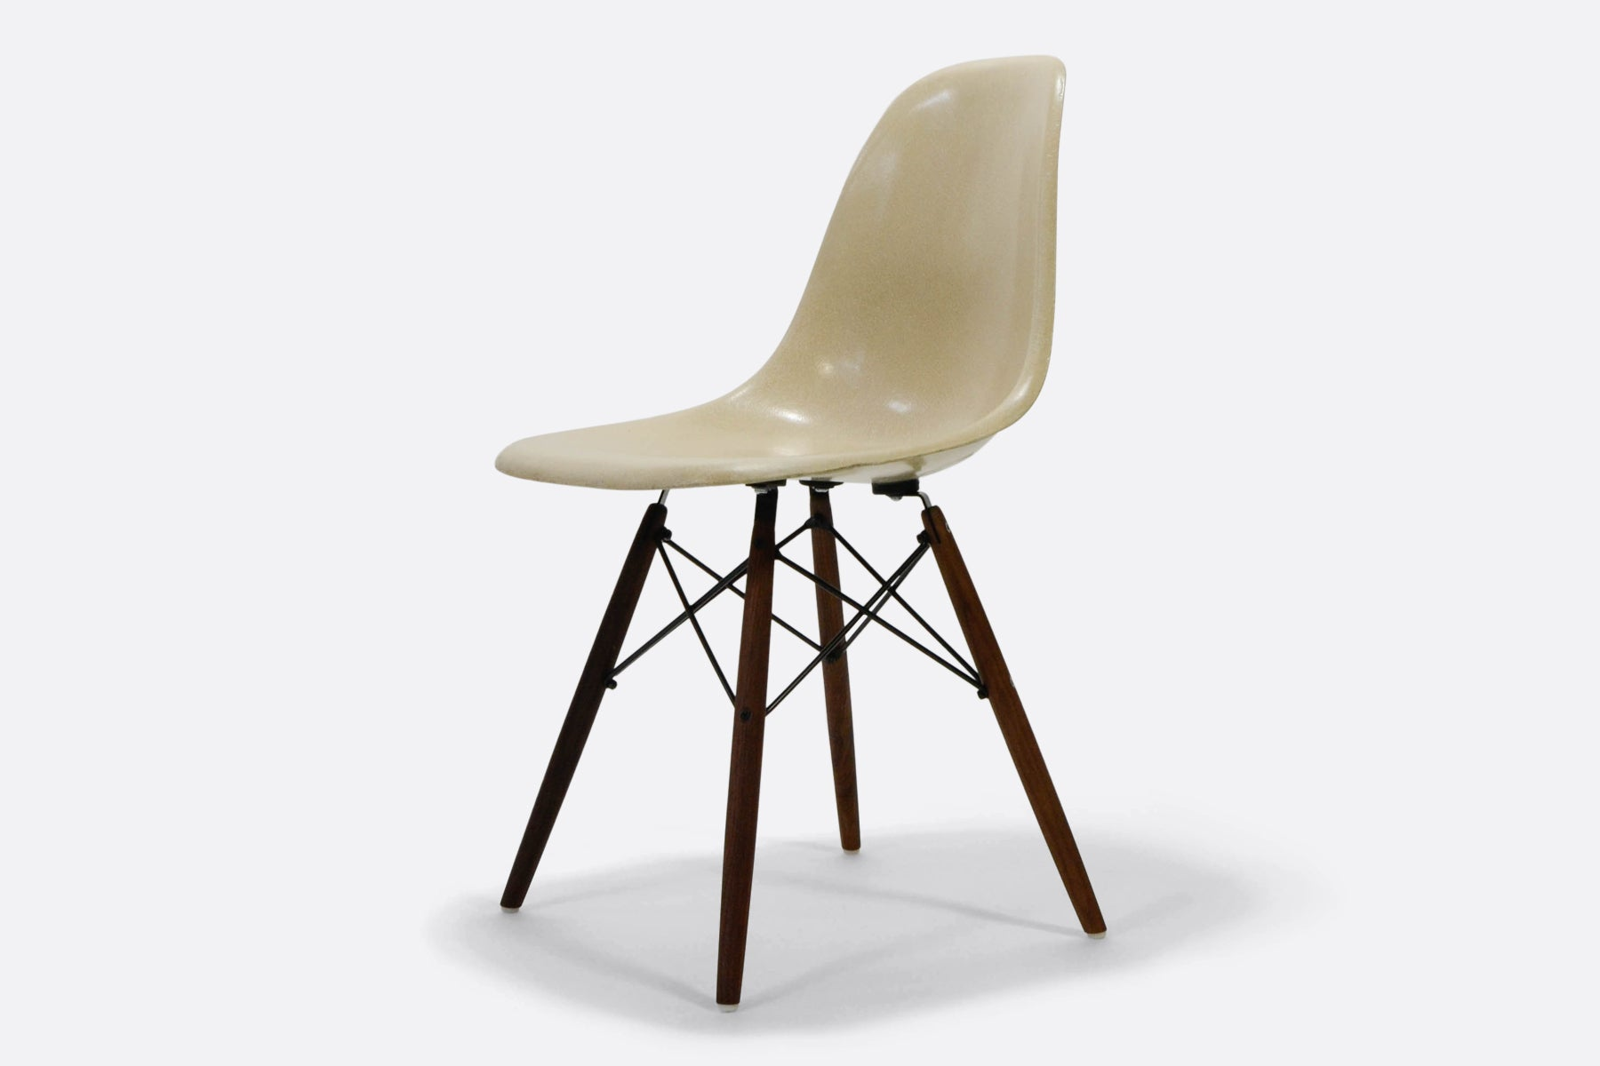 Eames Stoel Origineel : Modern vintage amsterdam original eames furniture u home